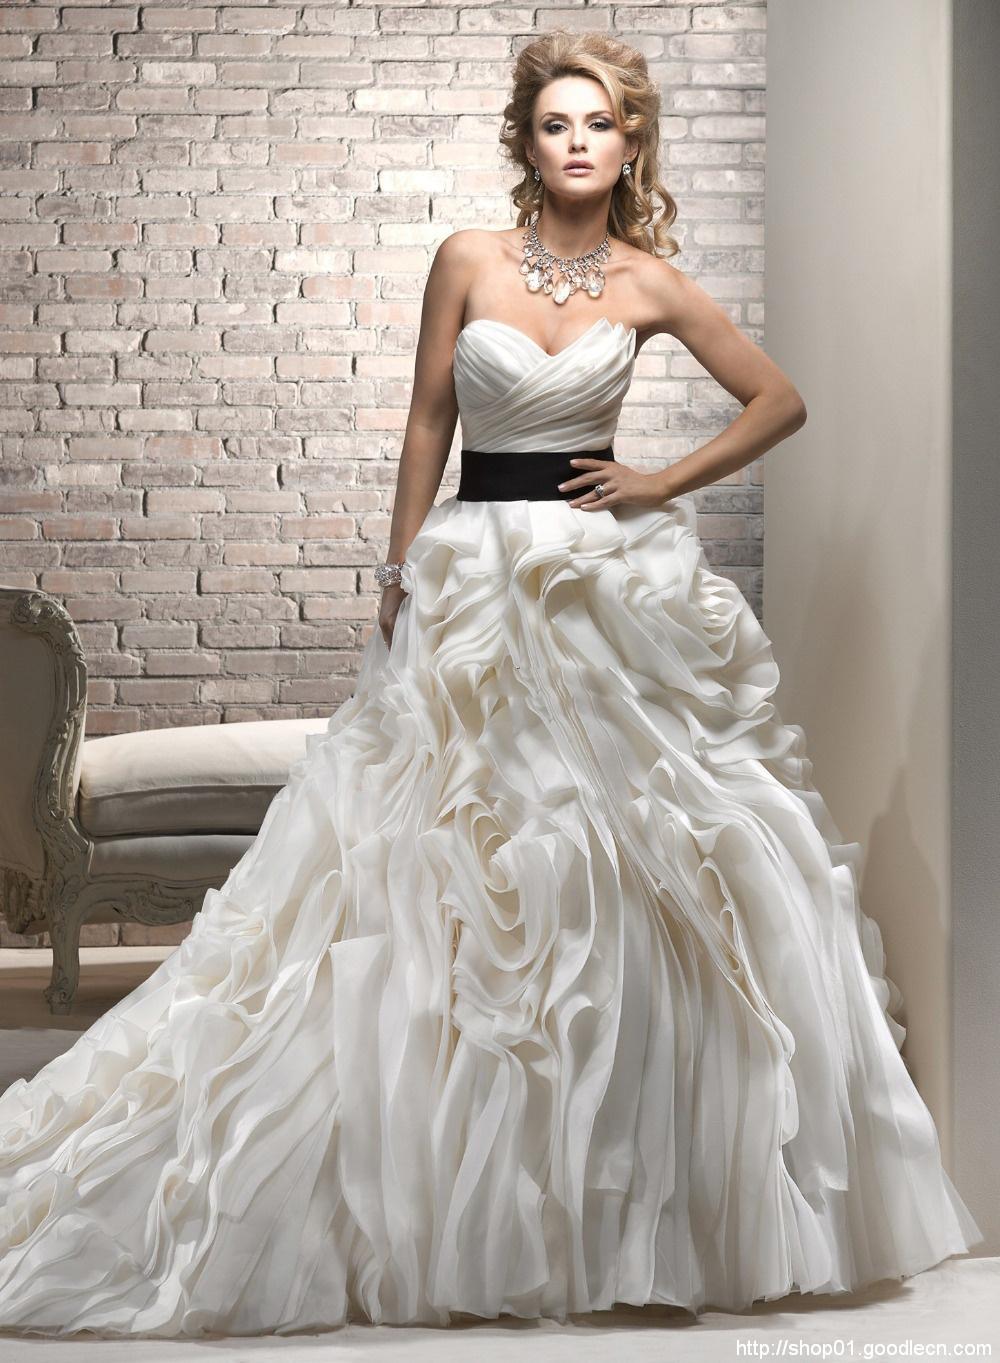 Wedding Dres 2013 New Design Ivory Sash Cascading Ruffles Strapless Sleeveless Custom Wedding Dress Wedding Ball Gowns JK013